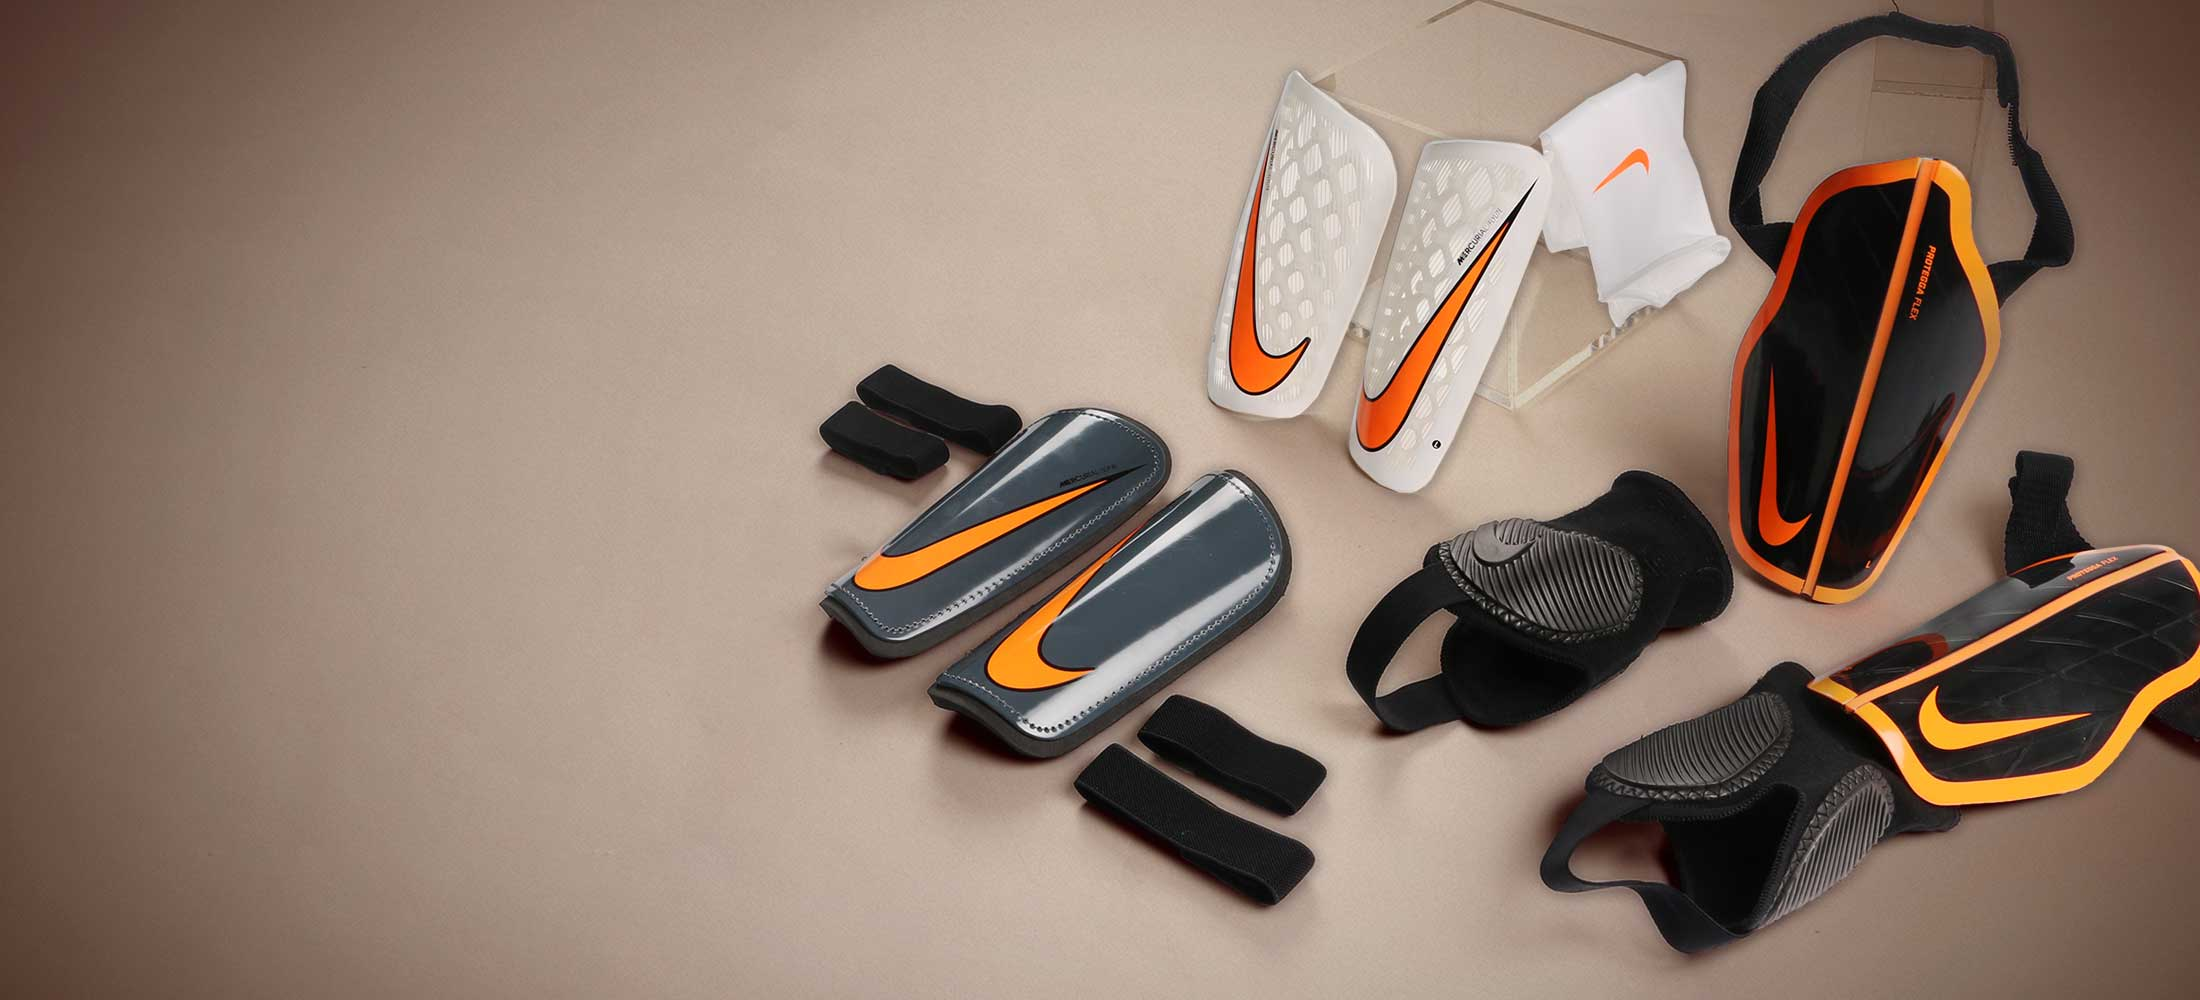 Espinilleras de fútbol Nike